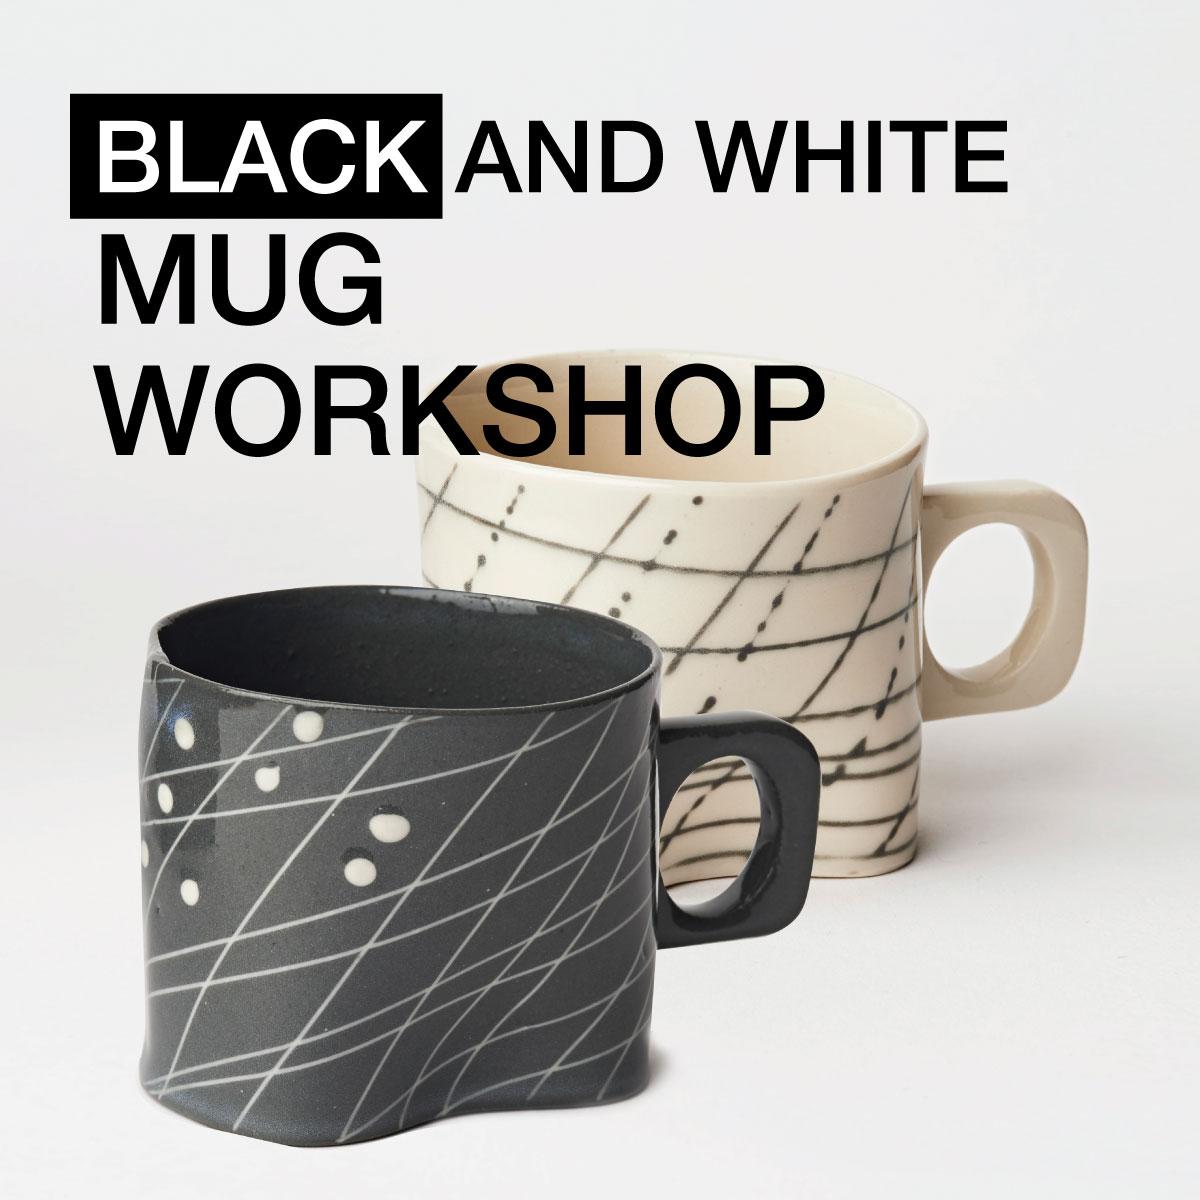 Black-and-white-mug2.jpg